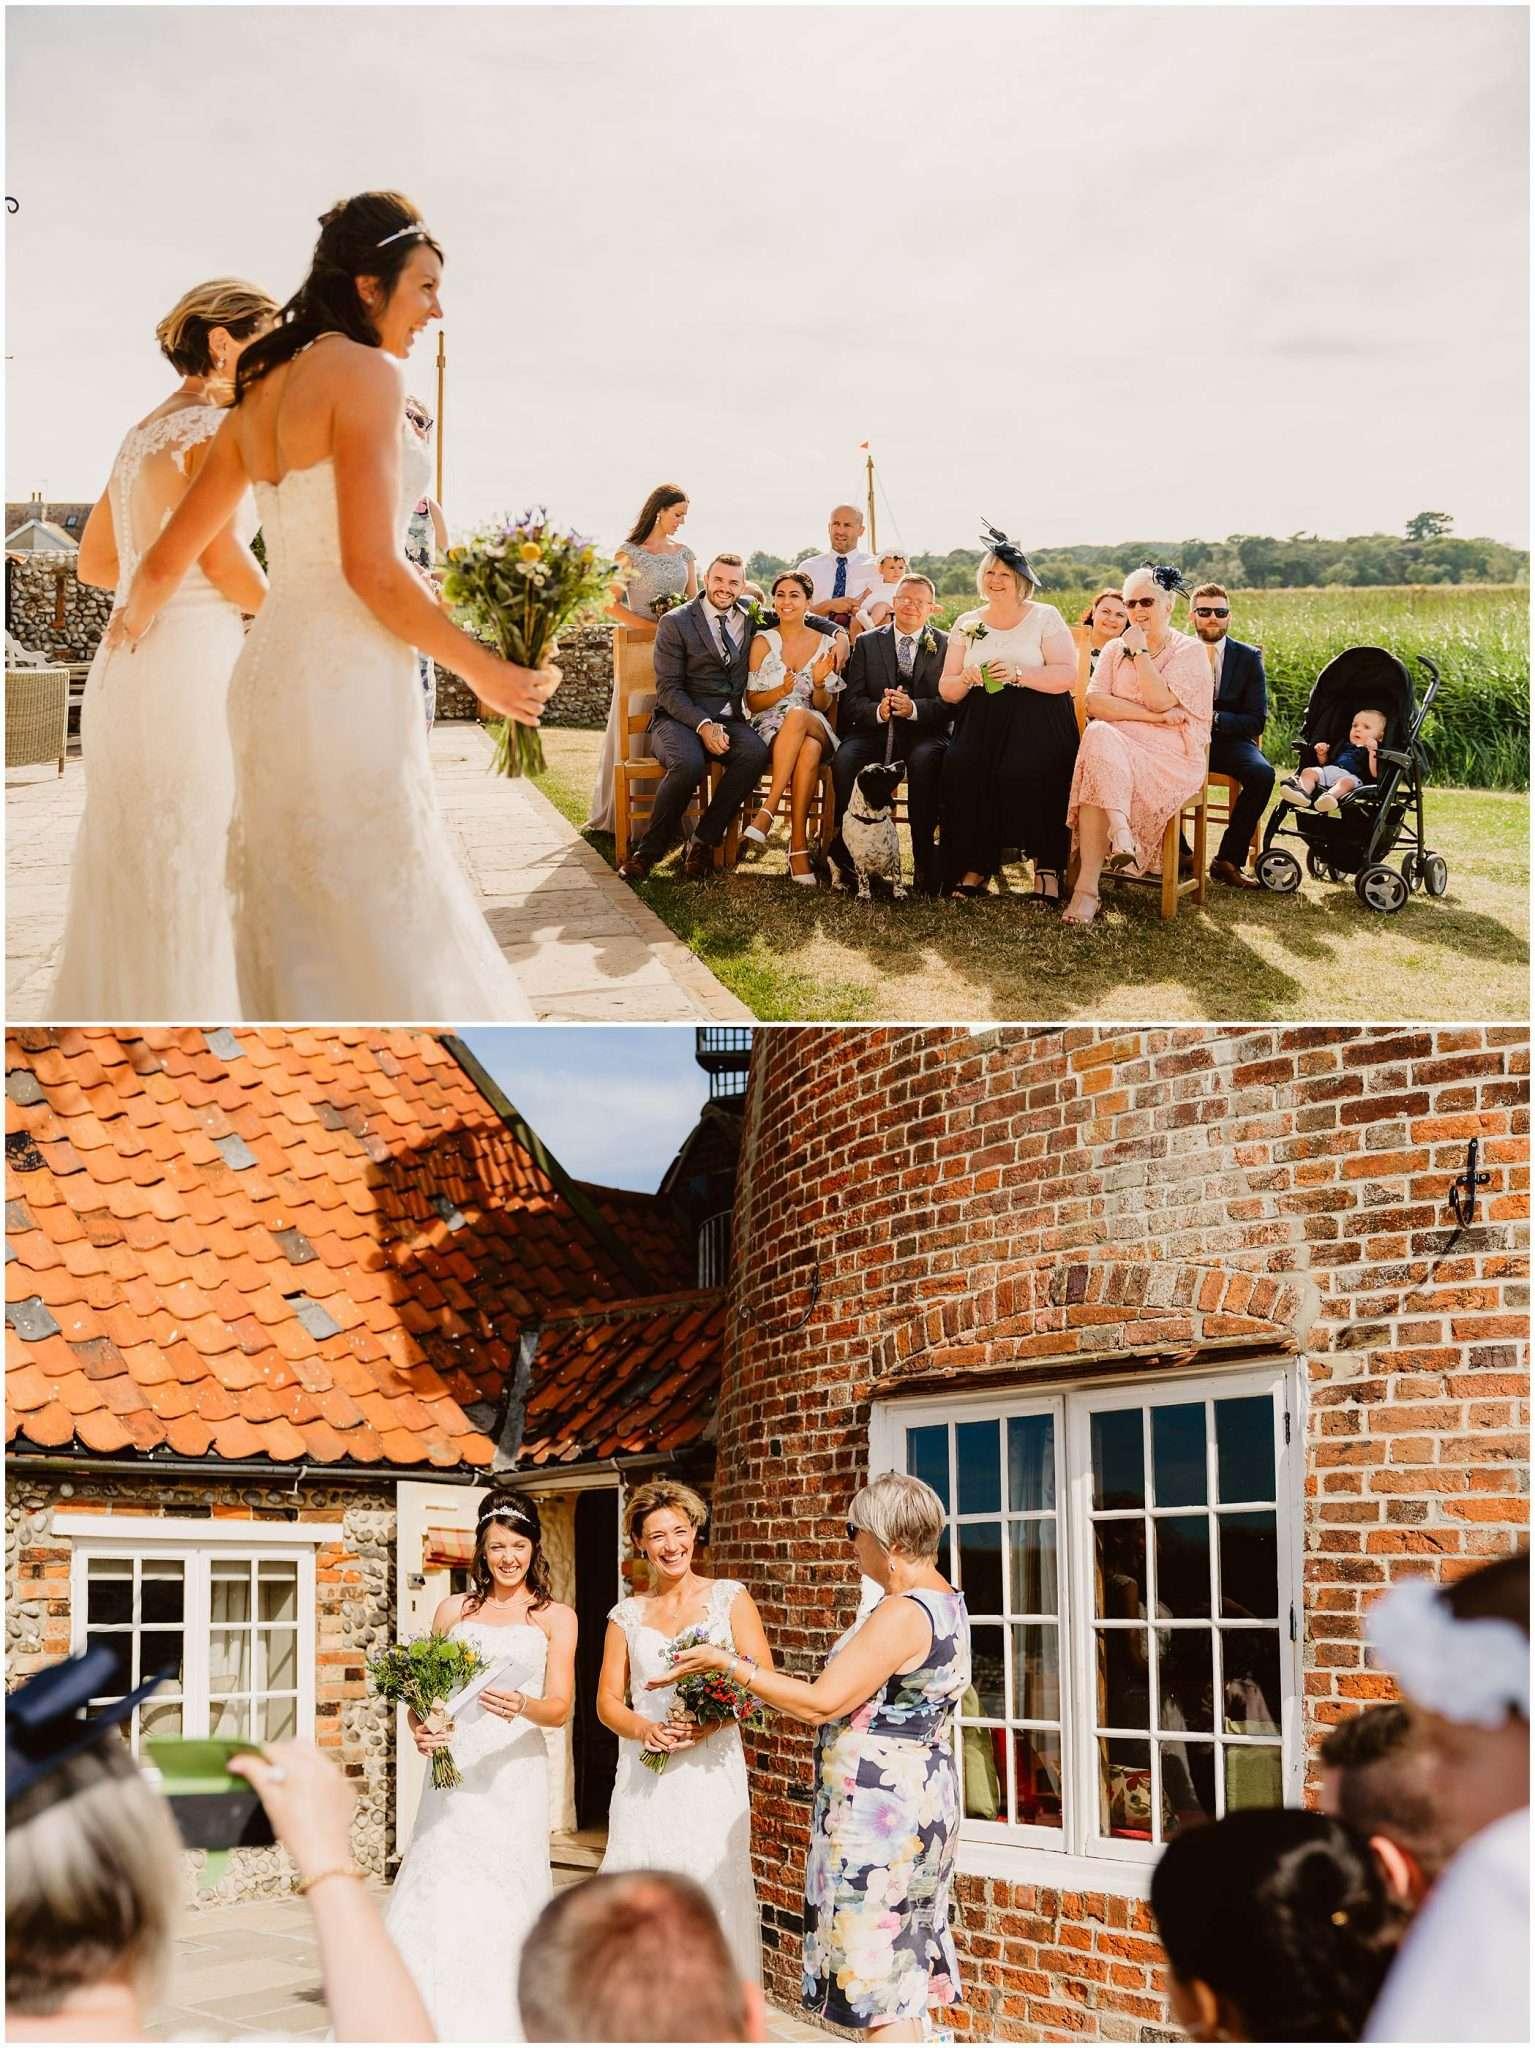 NATALIE AND REBECCA'S CLEY WINDMILL WEDDING - NORFOLK WEDDING PHOTOGRAPHER